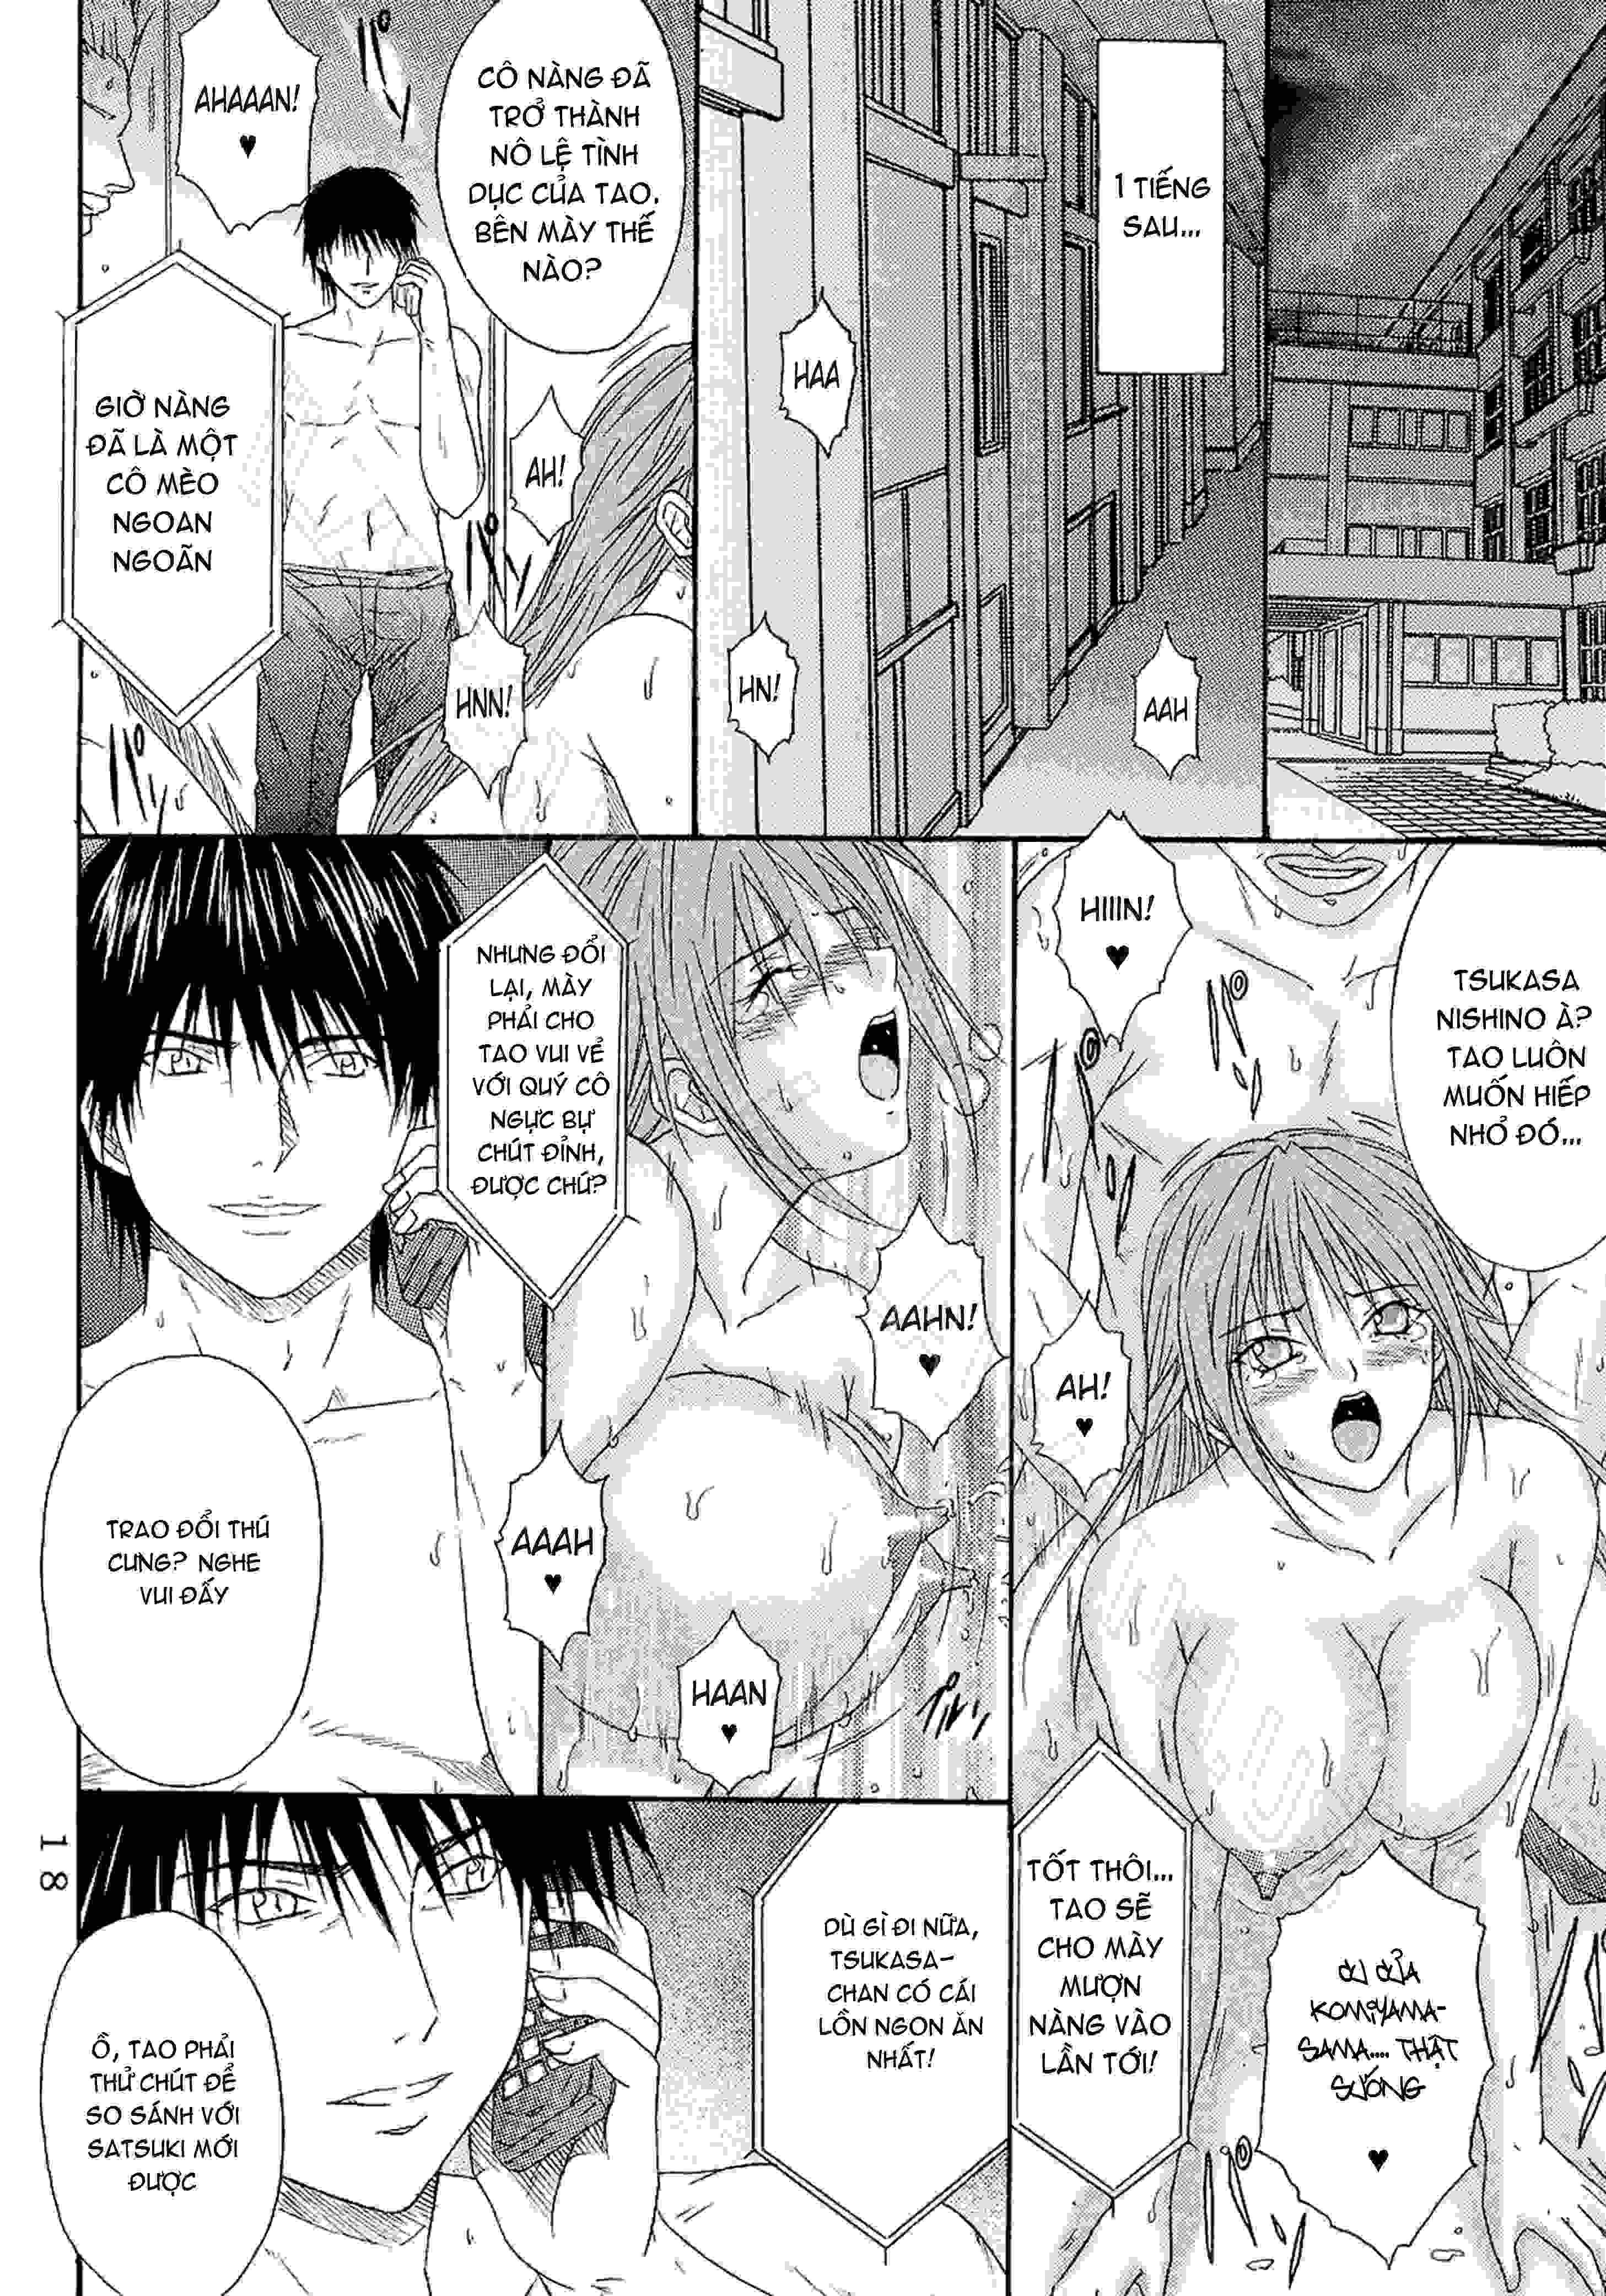 TruyenHay.Com - Ảnh 17 - Ryoujoku Rensa Chapter 6